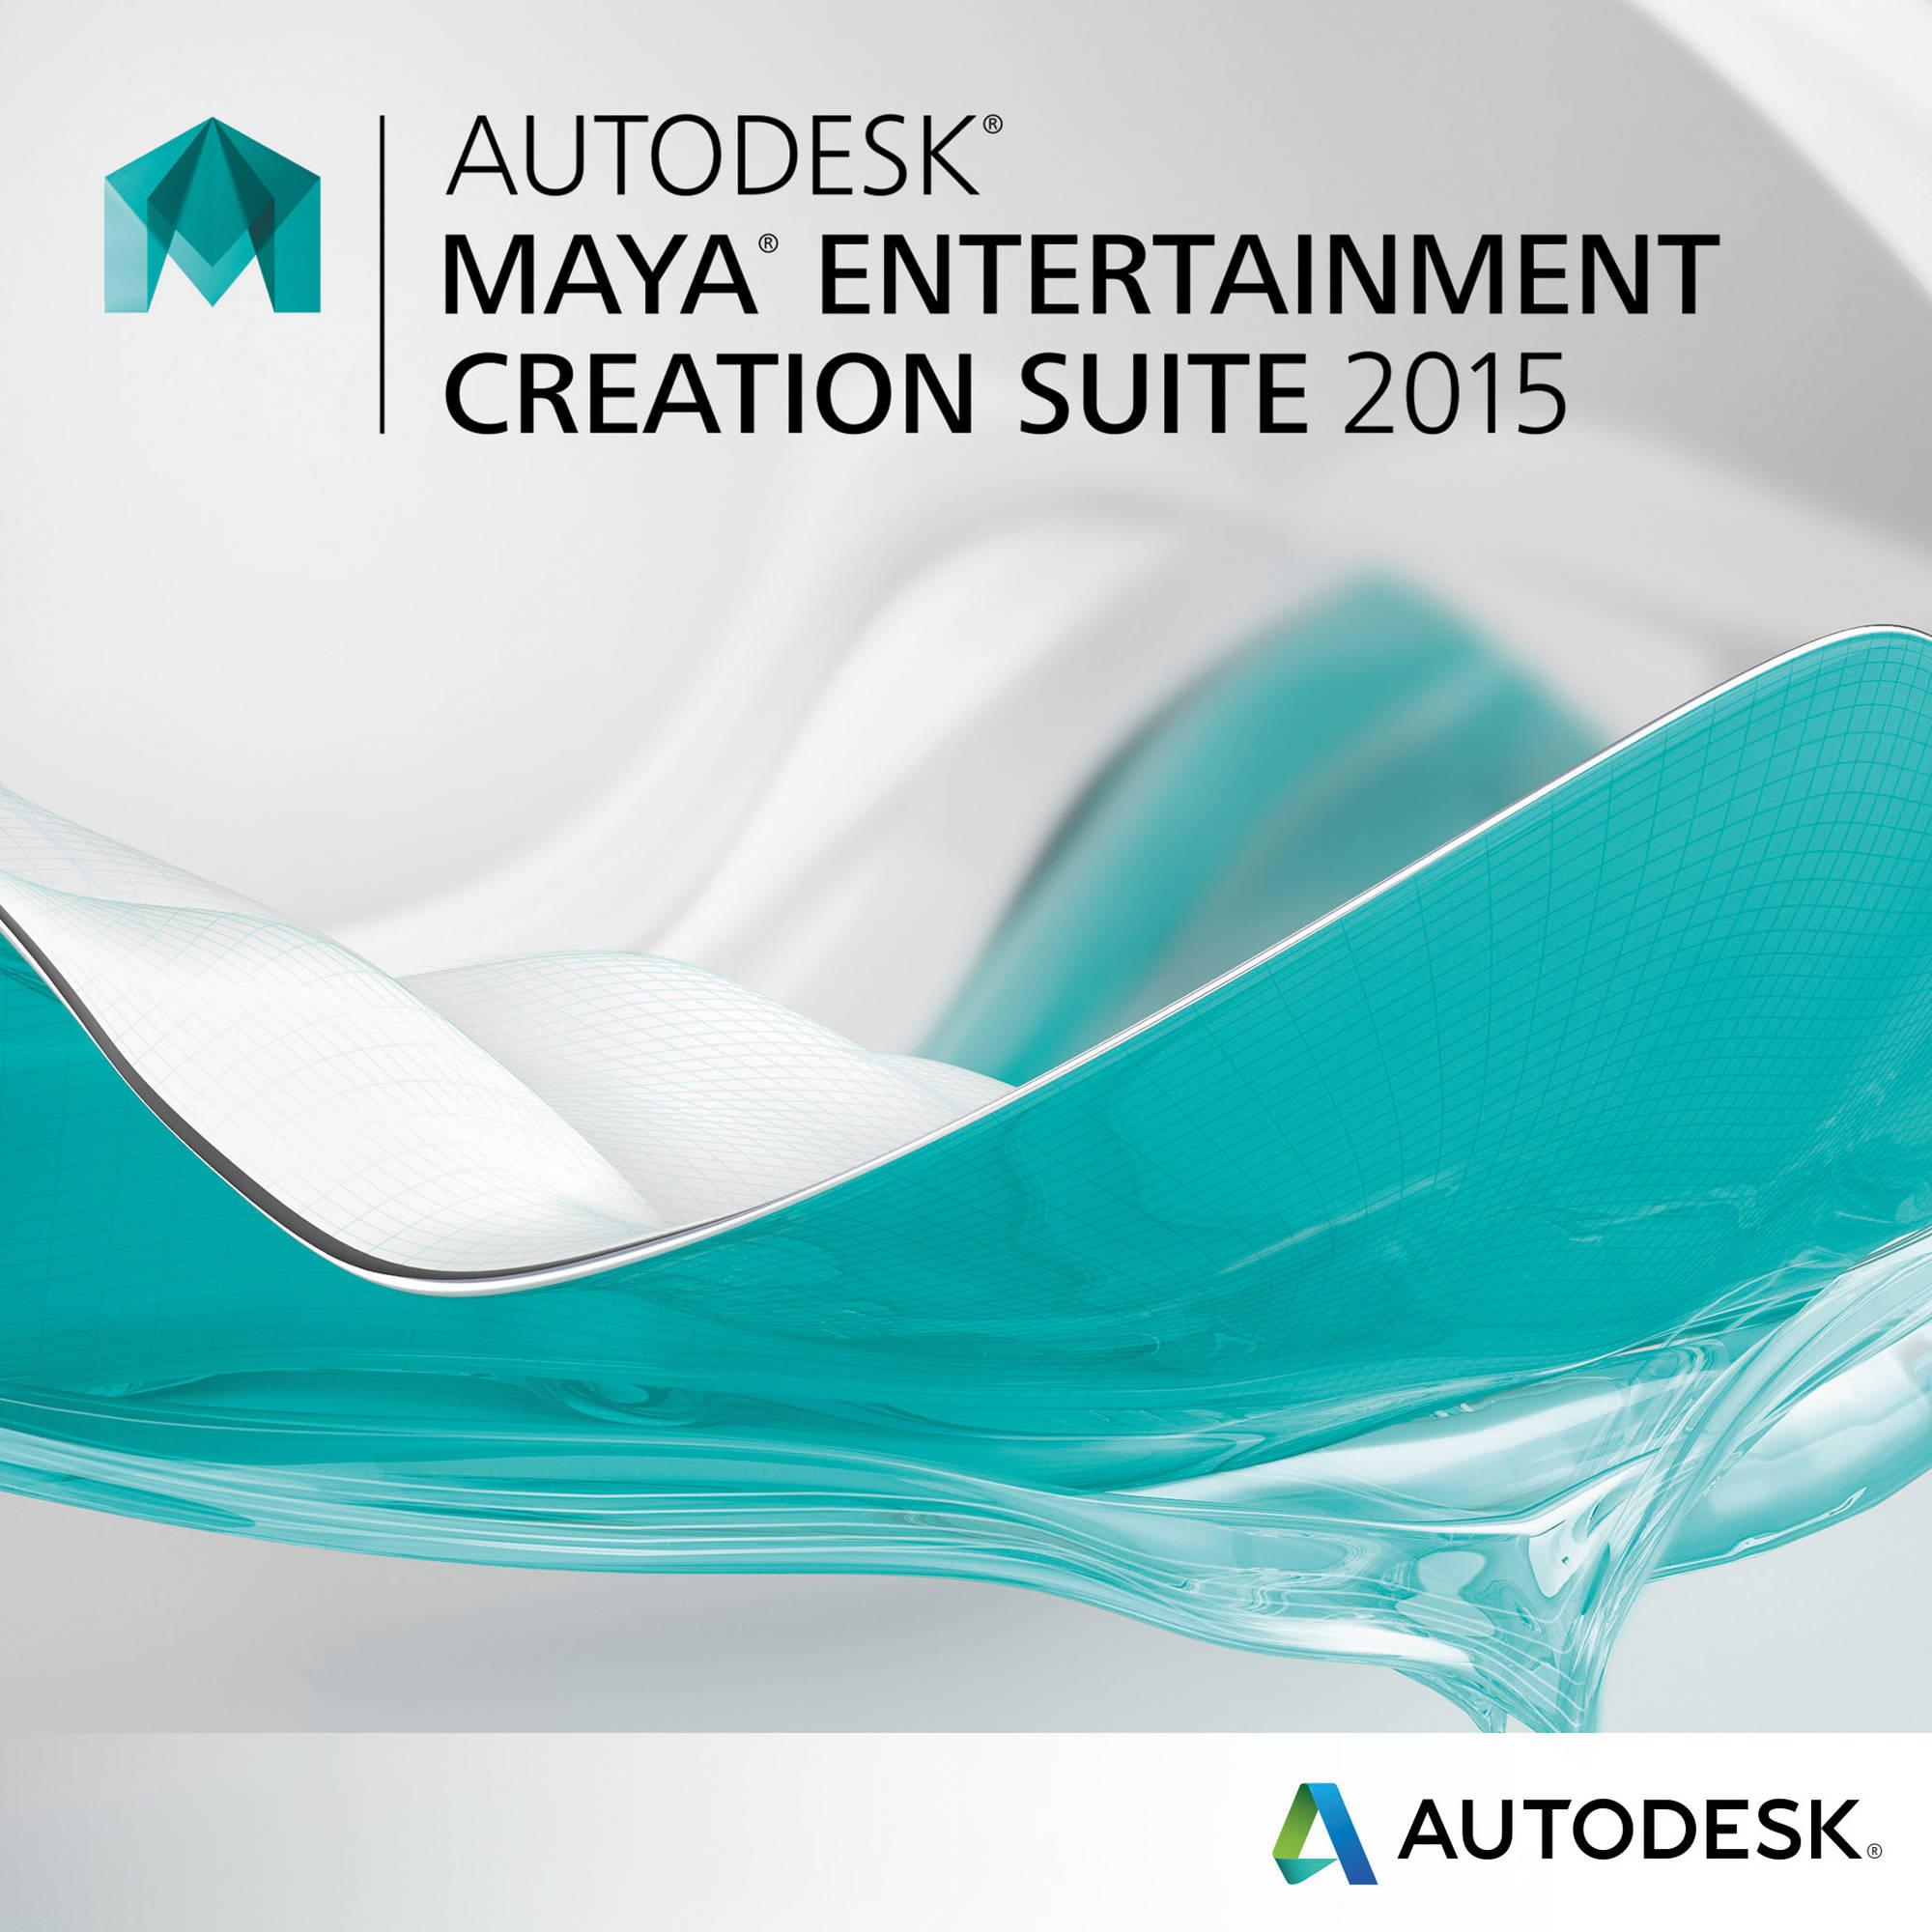 Autodesk Maya Entertainment Creation Suite 660g1 Wwr111 1001 Bh Circuit Wizard Standard Edition Download 2015